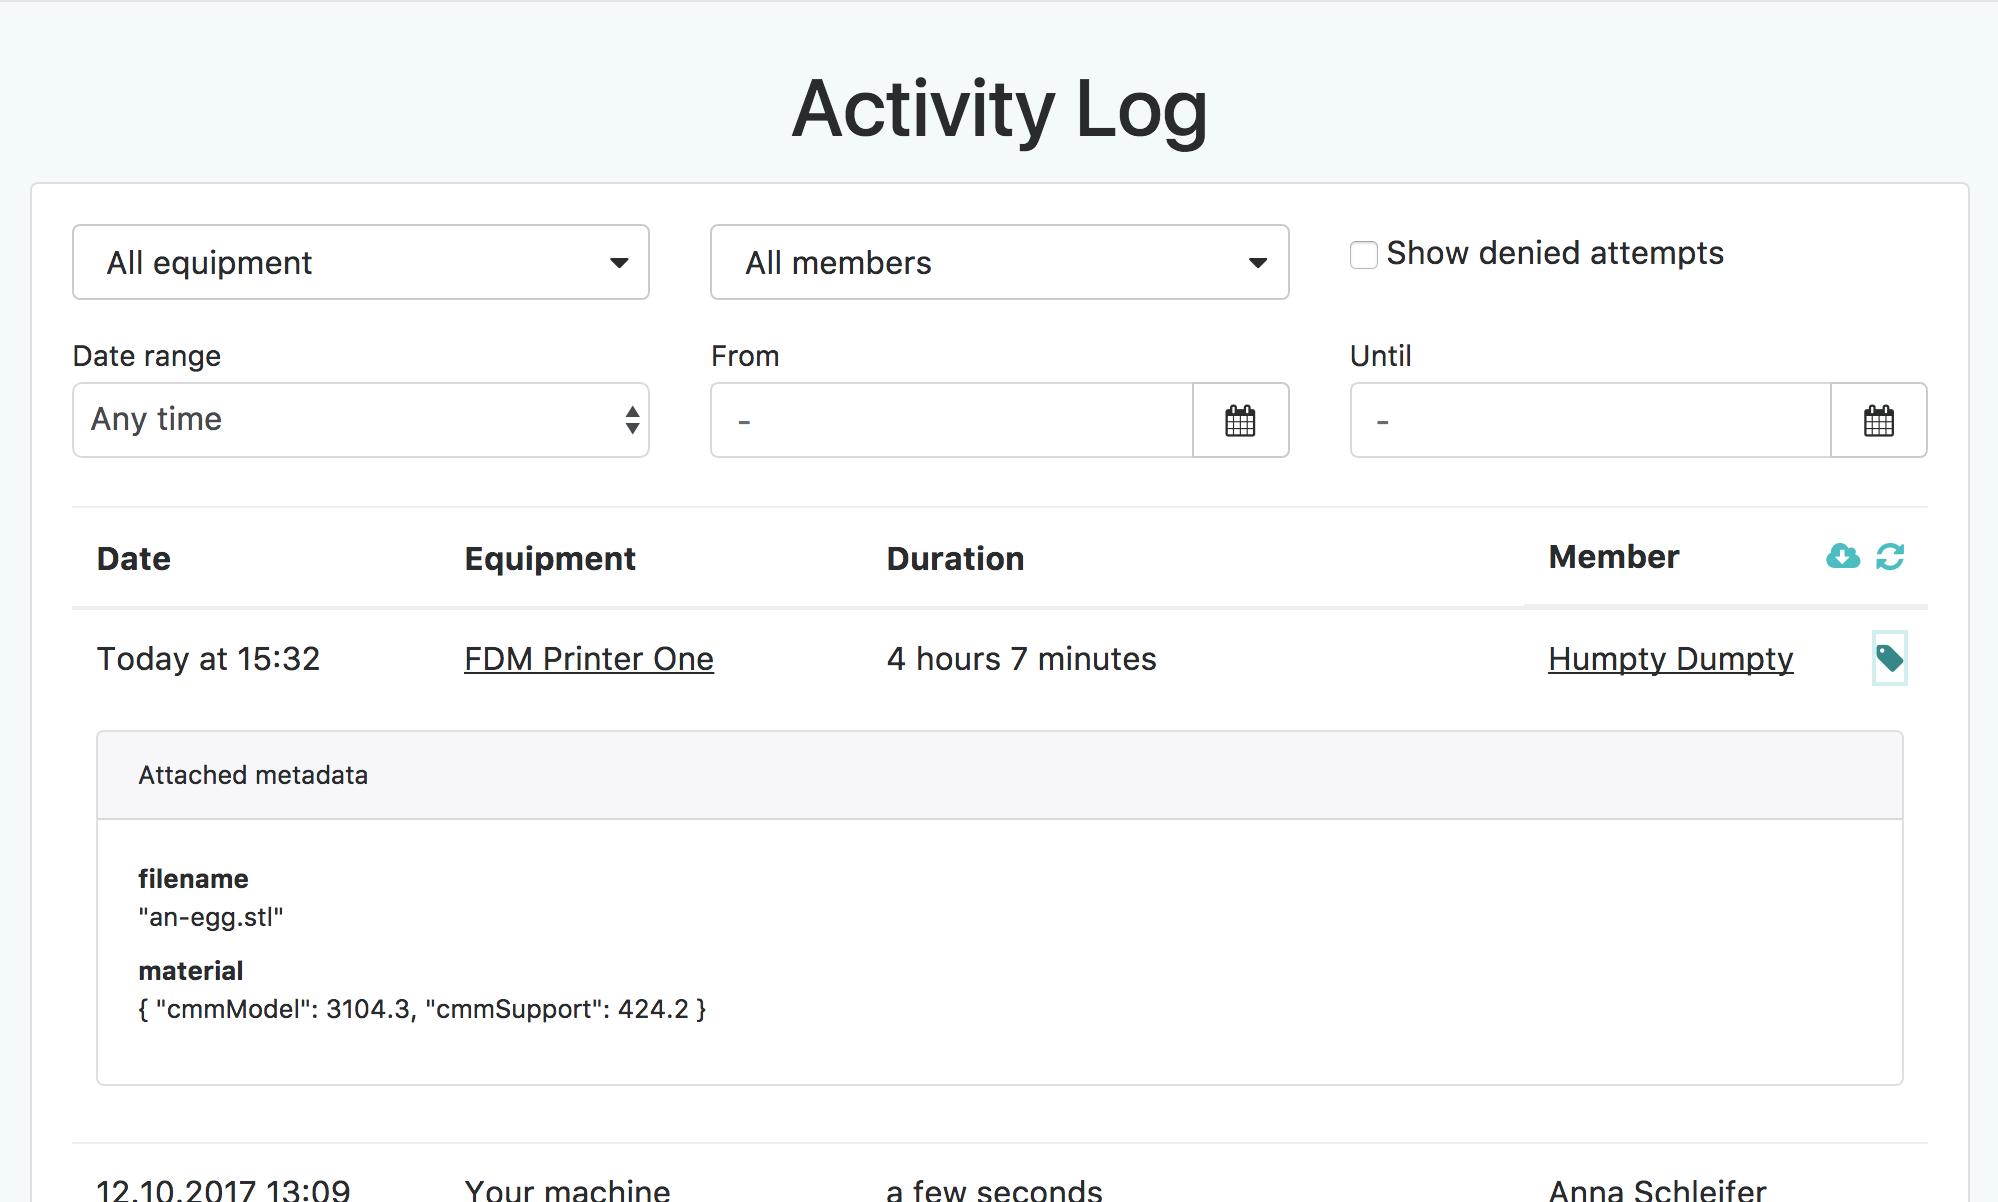 New APIs for 3rd-party bridges & activity log metadata ...